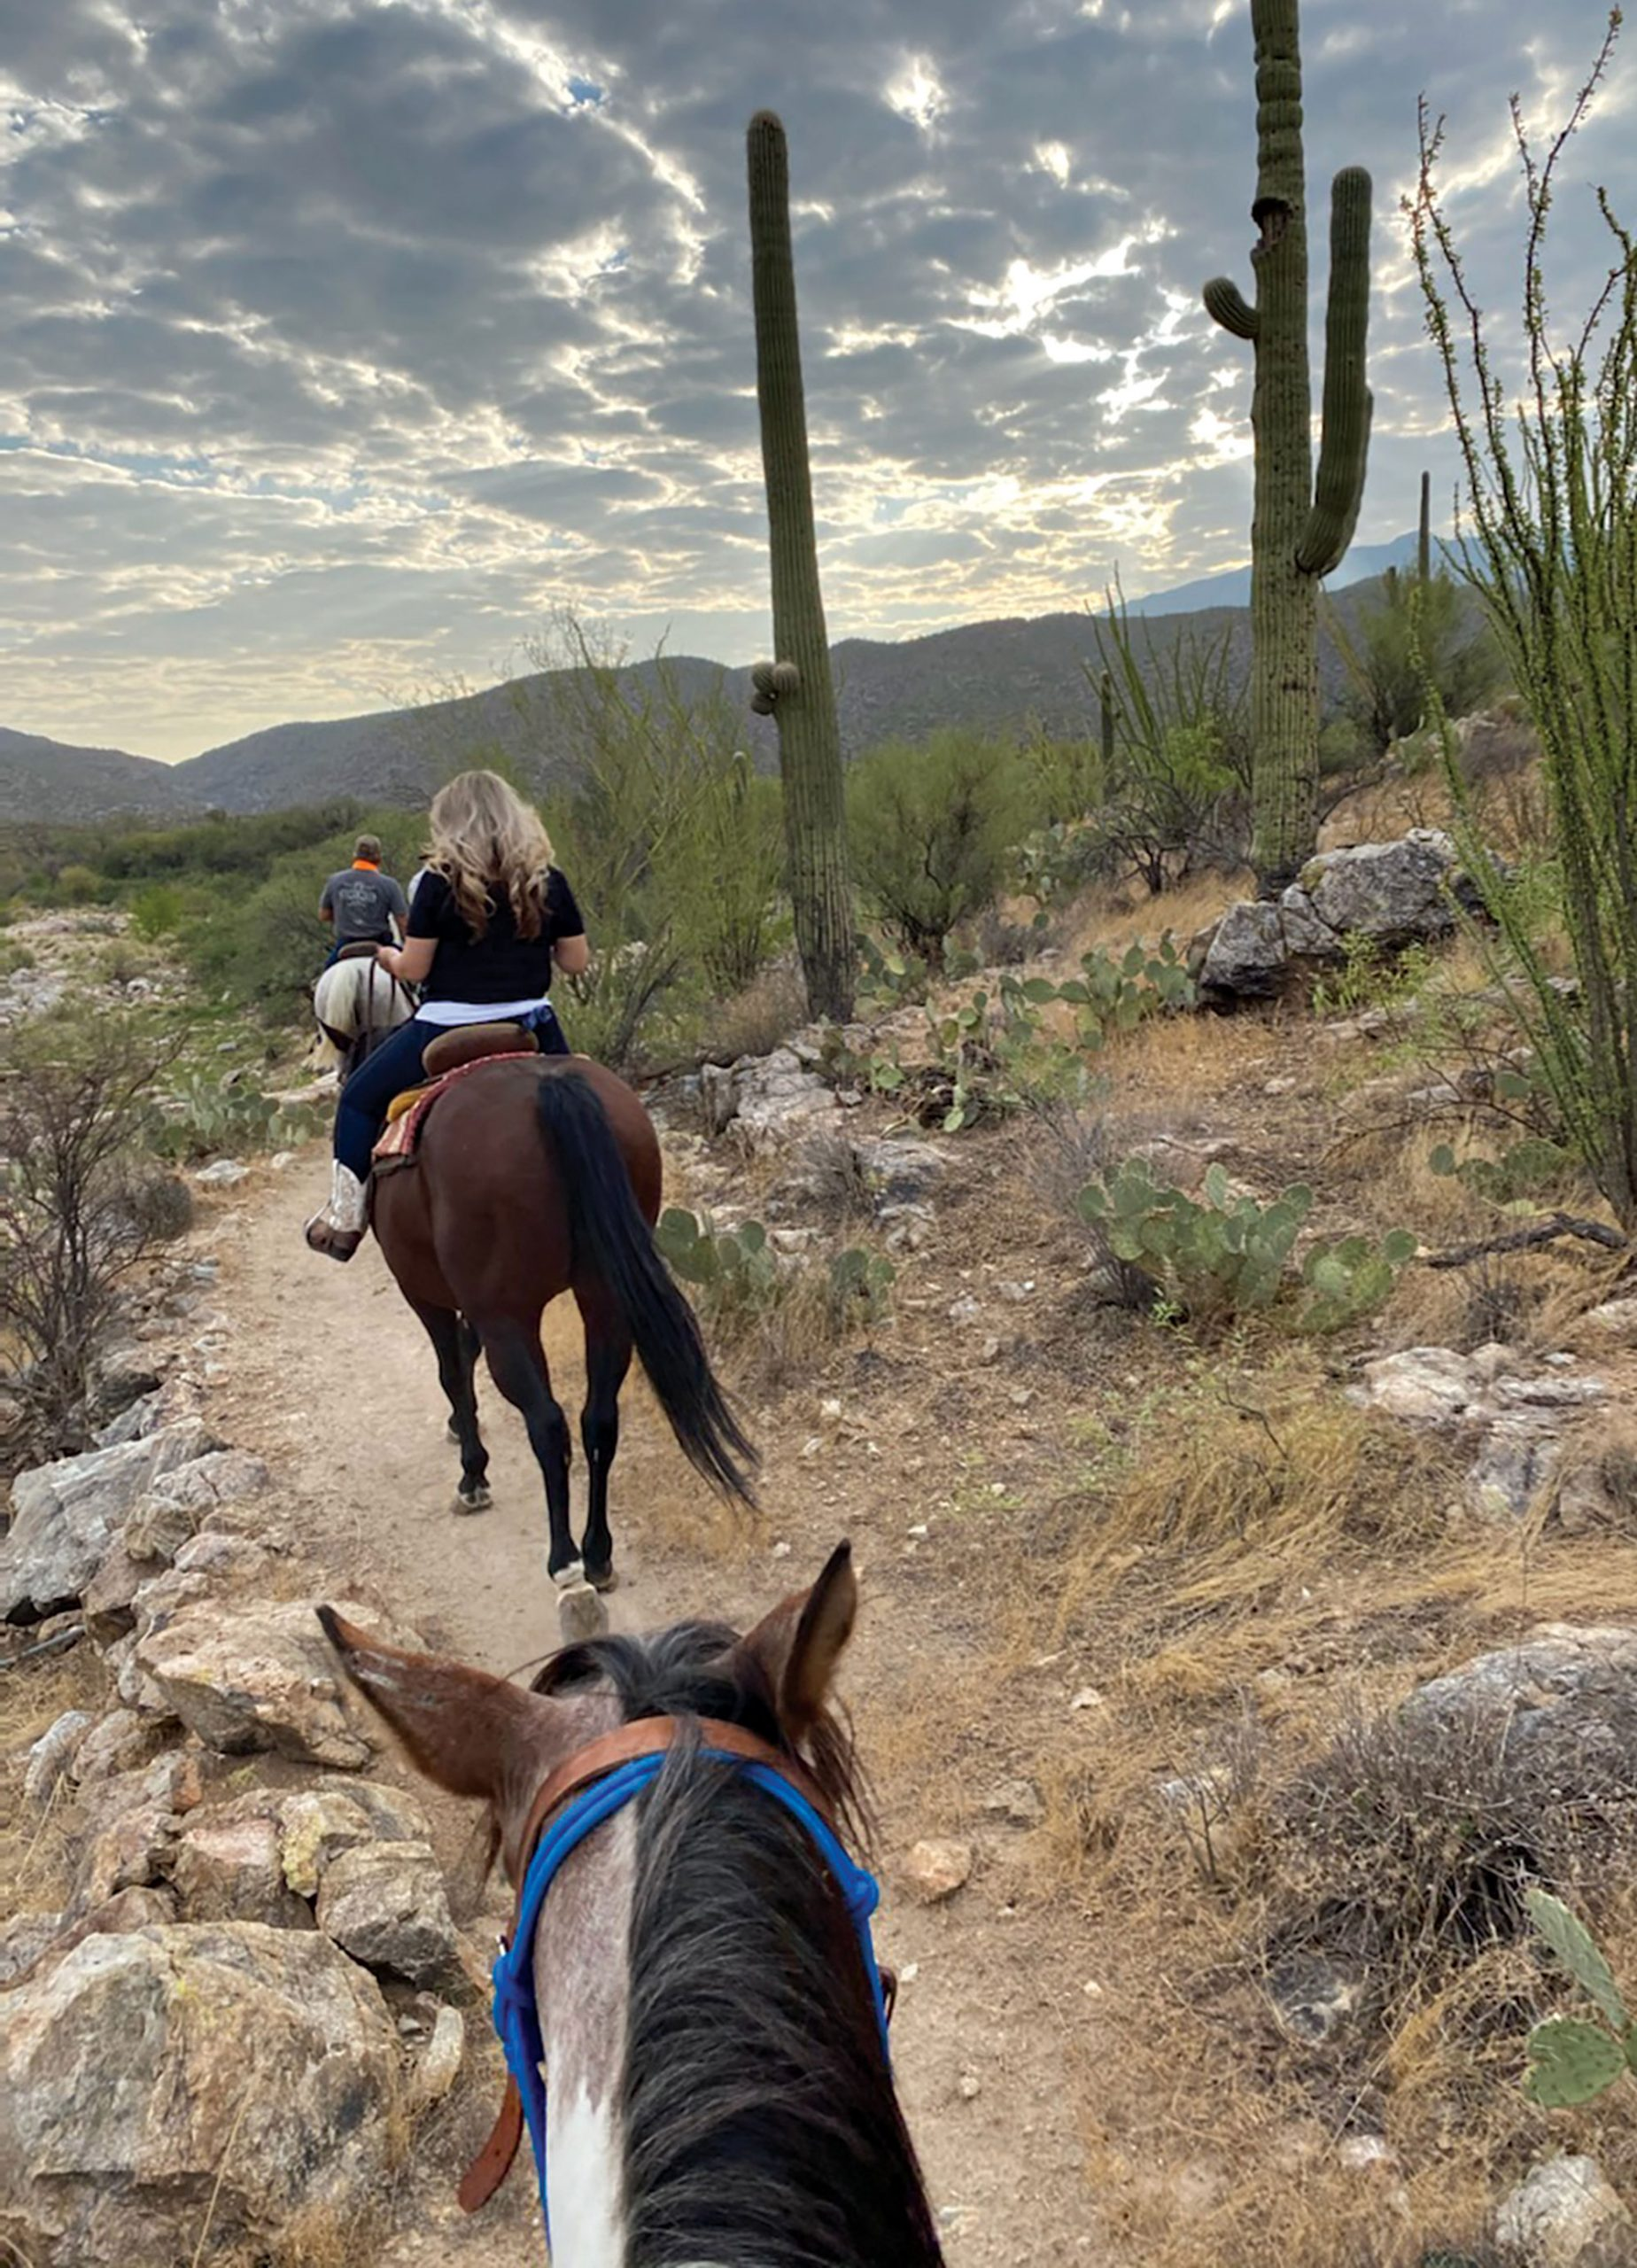 morning horseback ride; Photo by Madison Rutherford